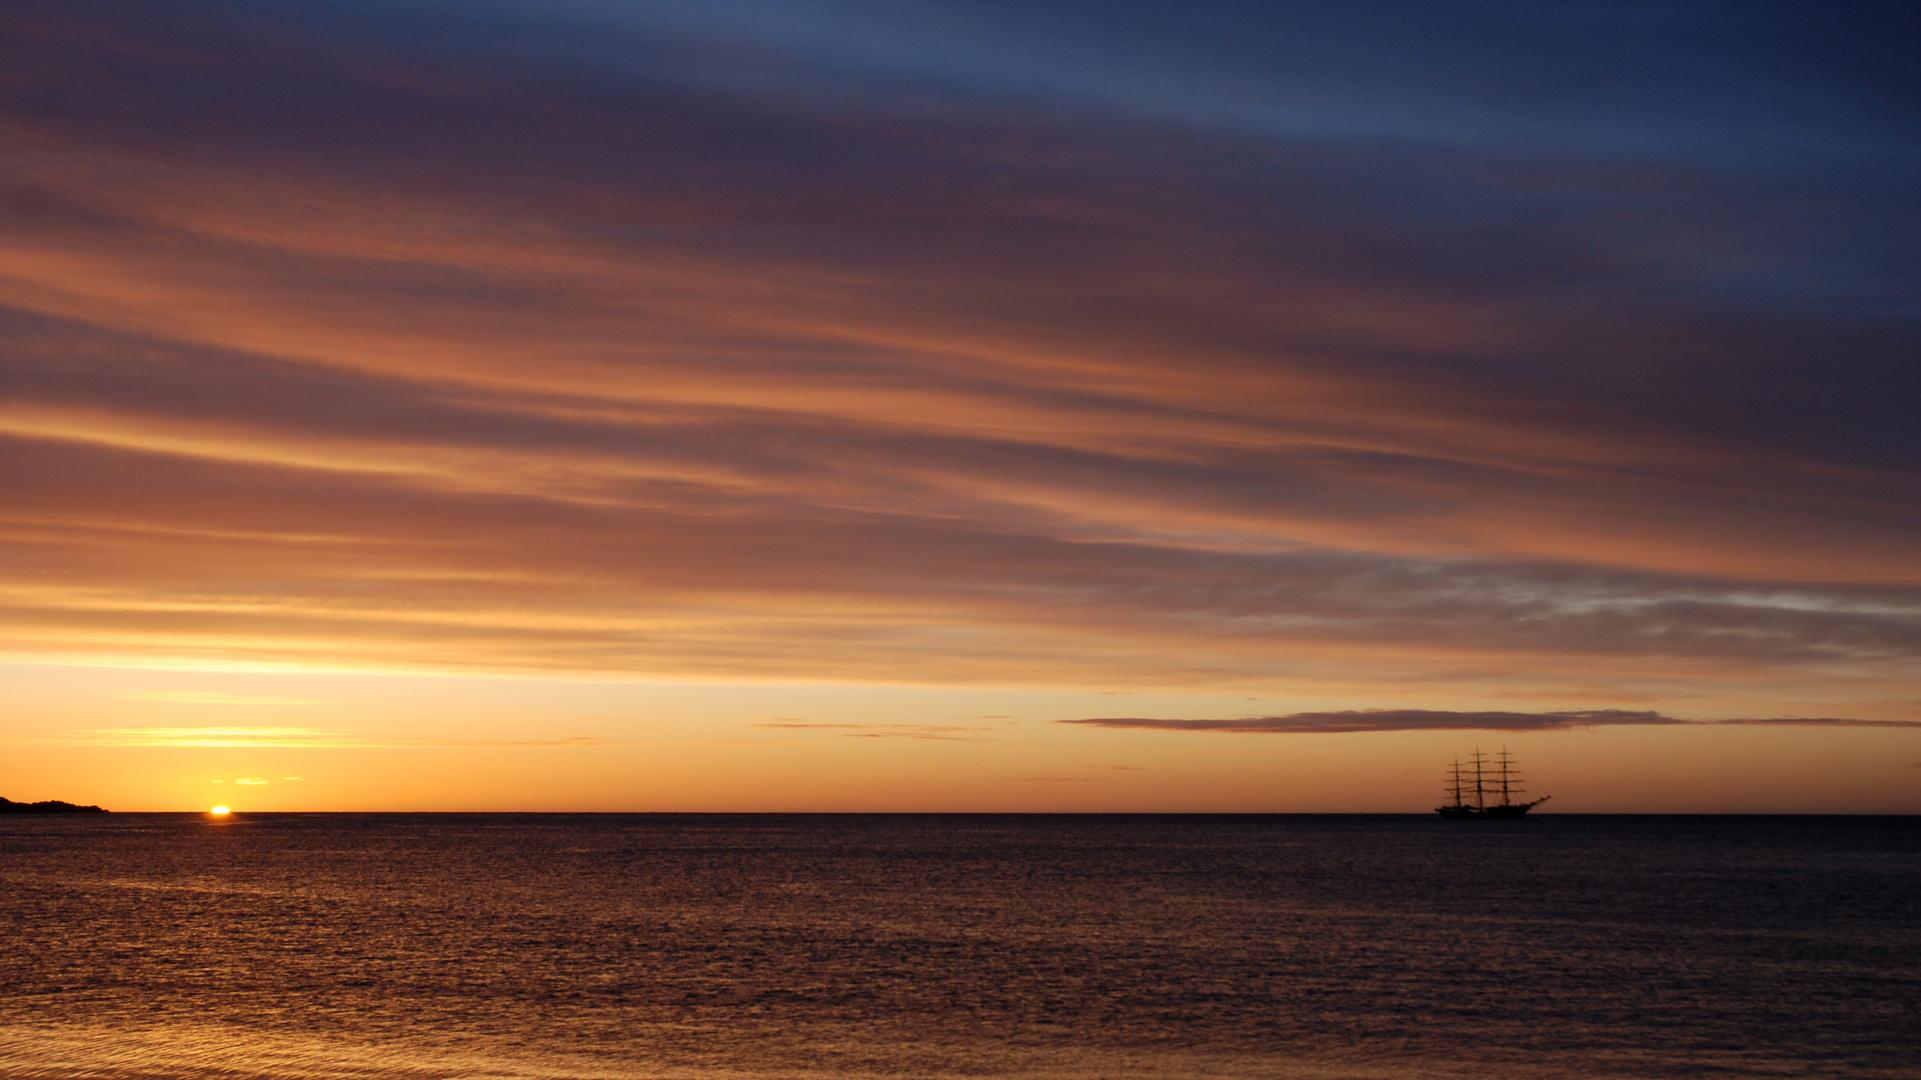 Schottland am Morgen